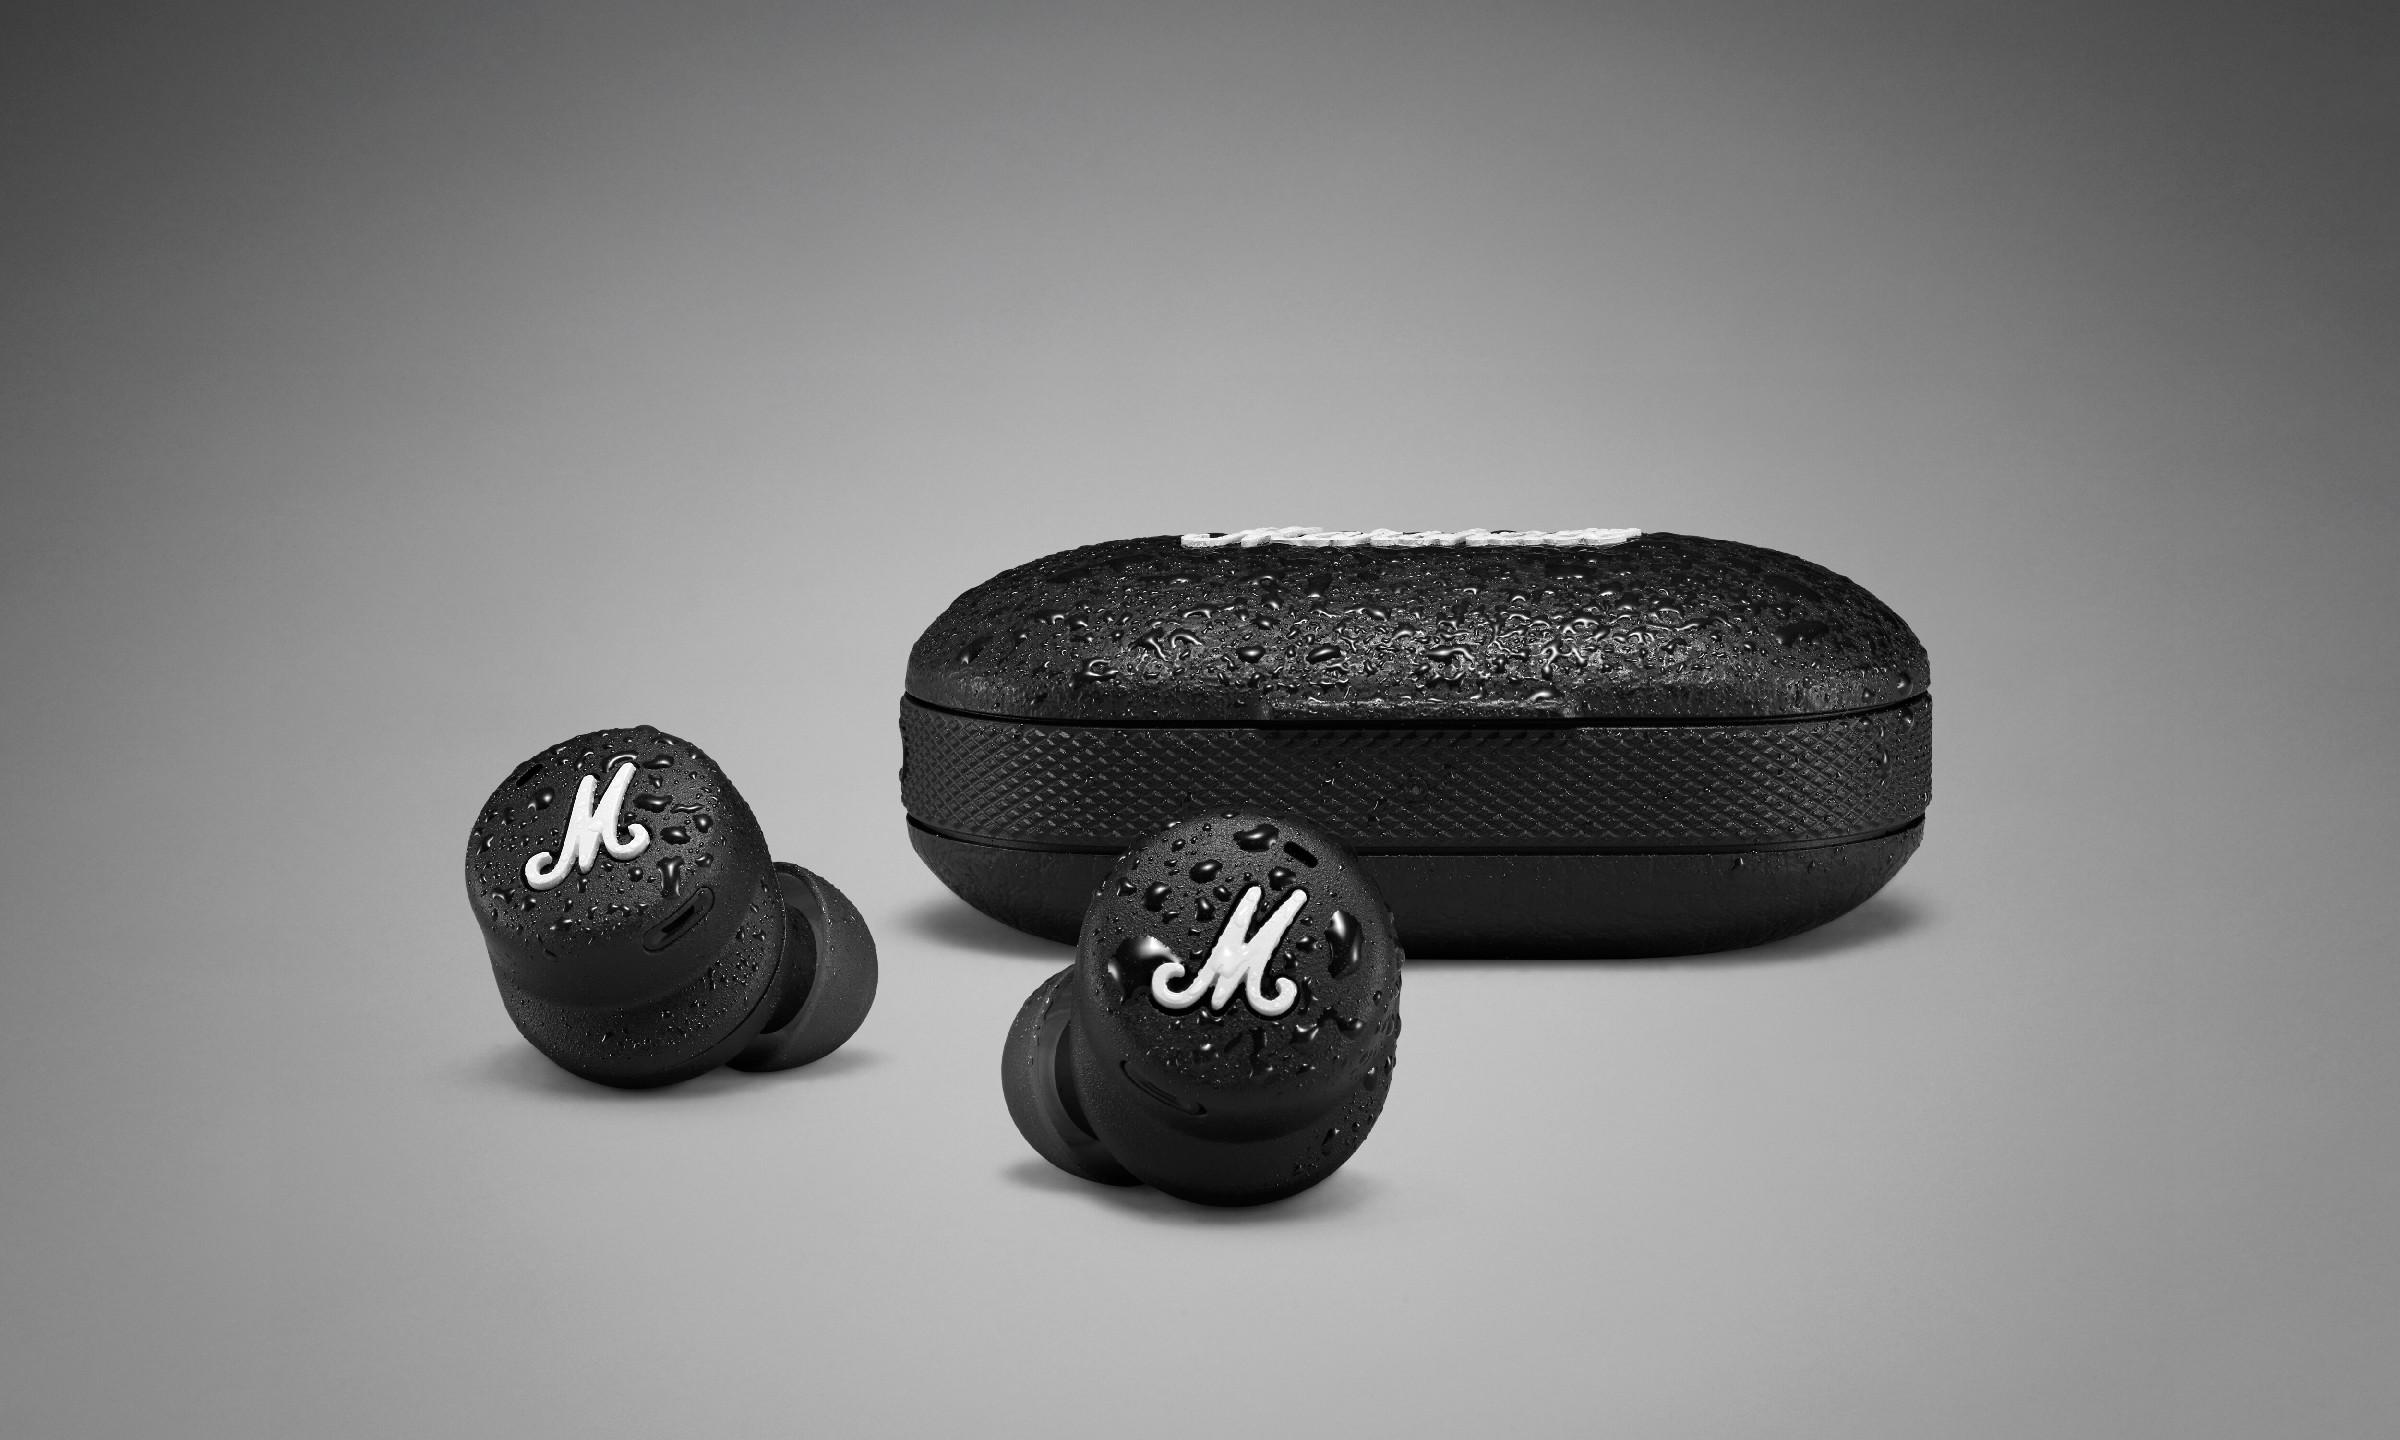 Marshall 发布首款真无线入耳式耳机 Mode II